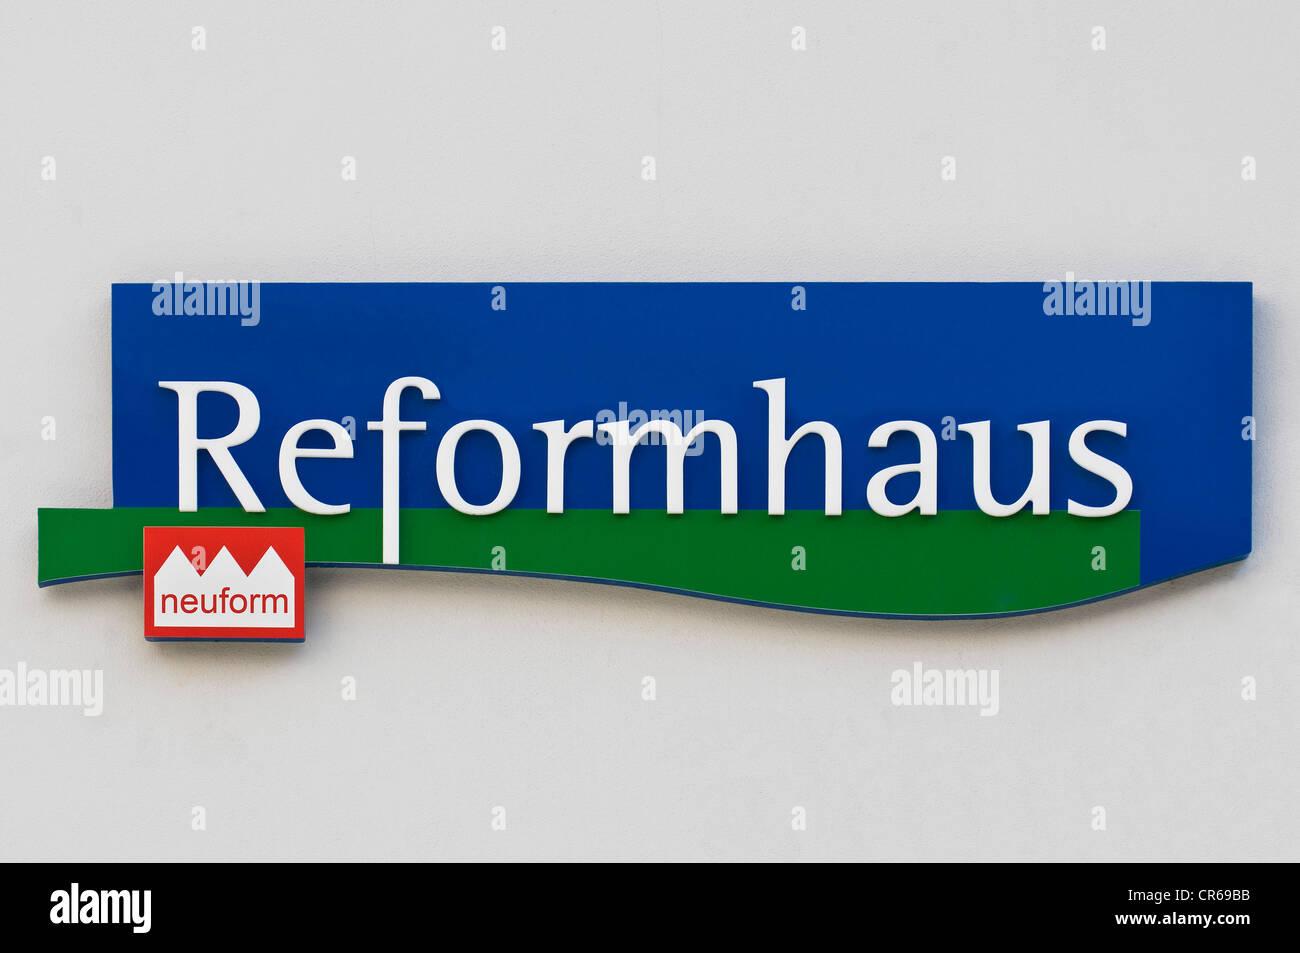 Logo, Neuform Reformhaus, cooperative health food stores from a union of Deutscher Reformhaeuser eG and neuform - Stock Image